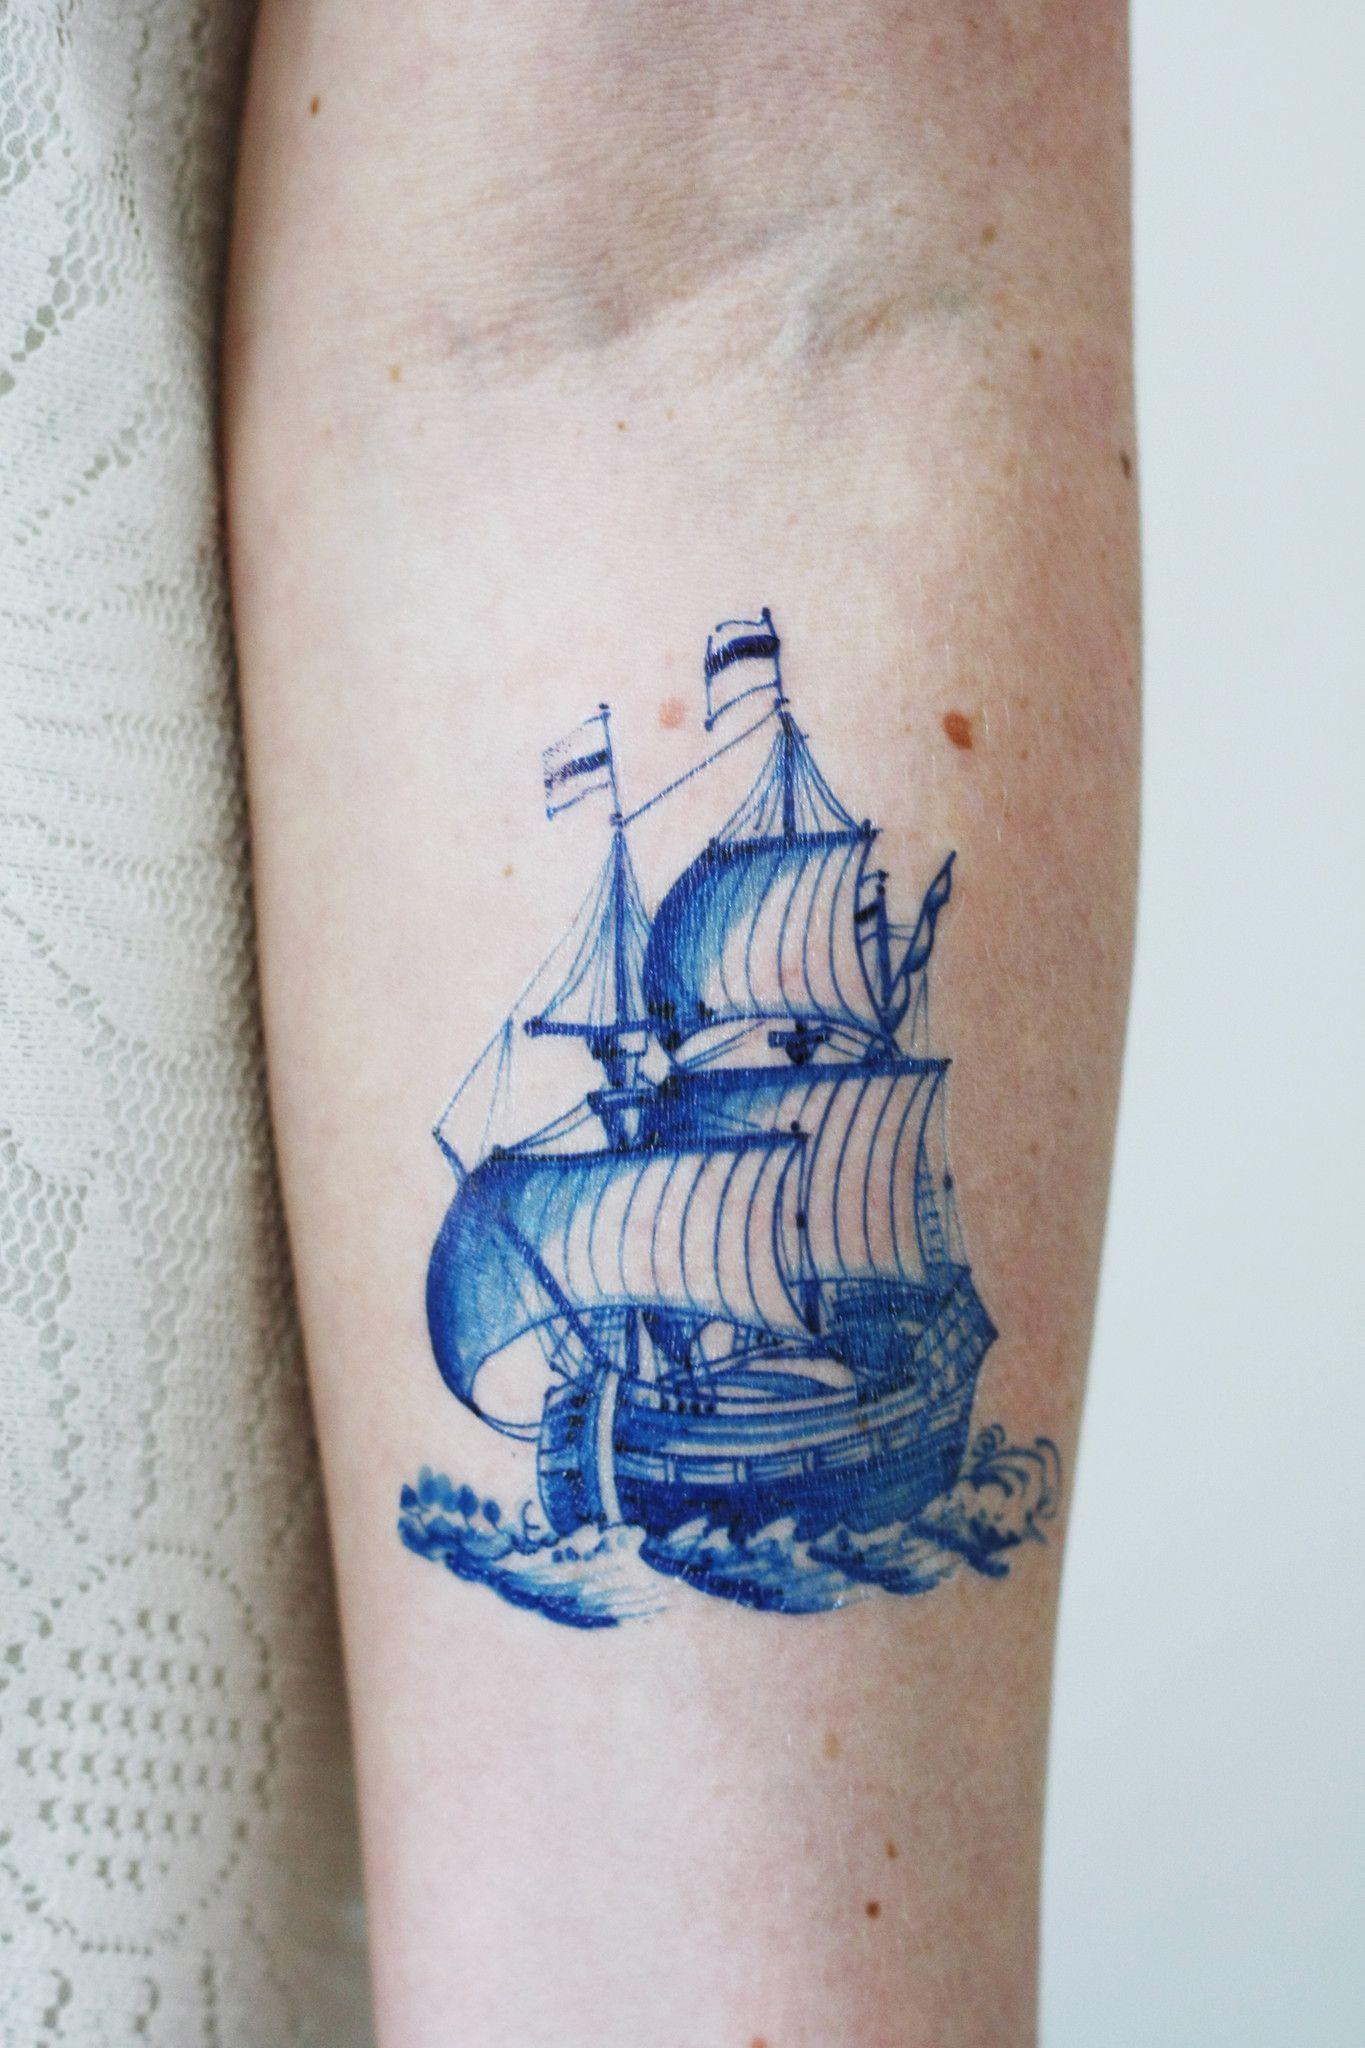 Delft Blue Ship Tattoo Art Inspirations Elegant Tattoos